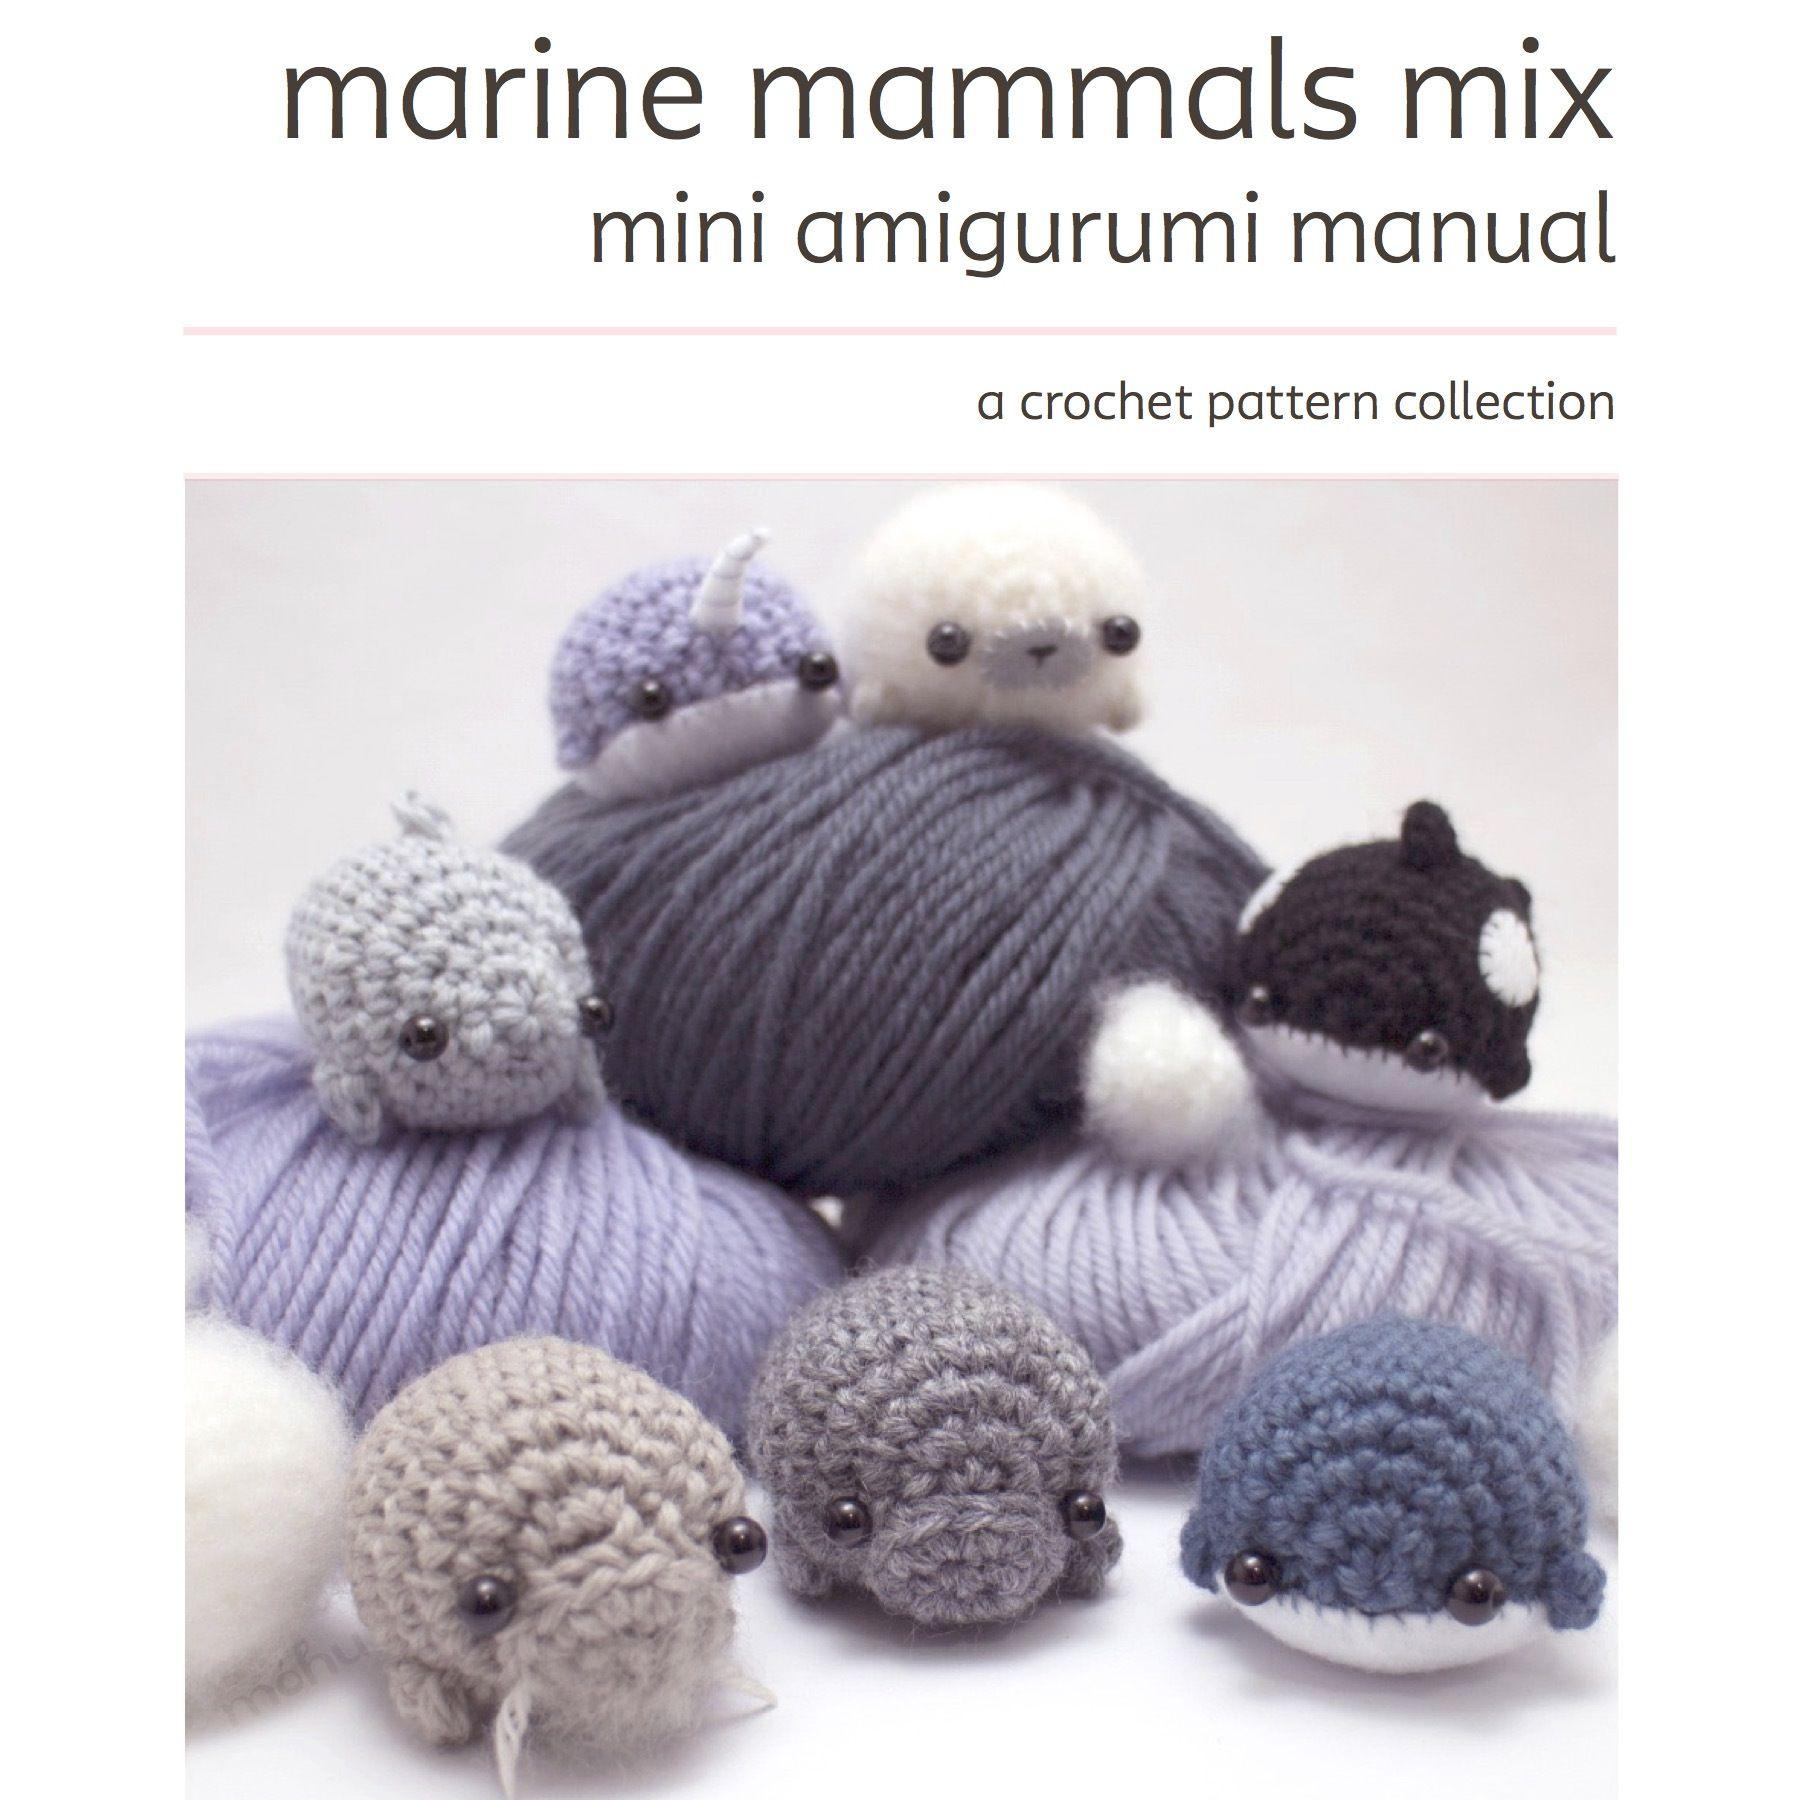 Crochet pattern collection - sea mammals | Amigurumi, Crochet and ...